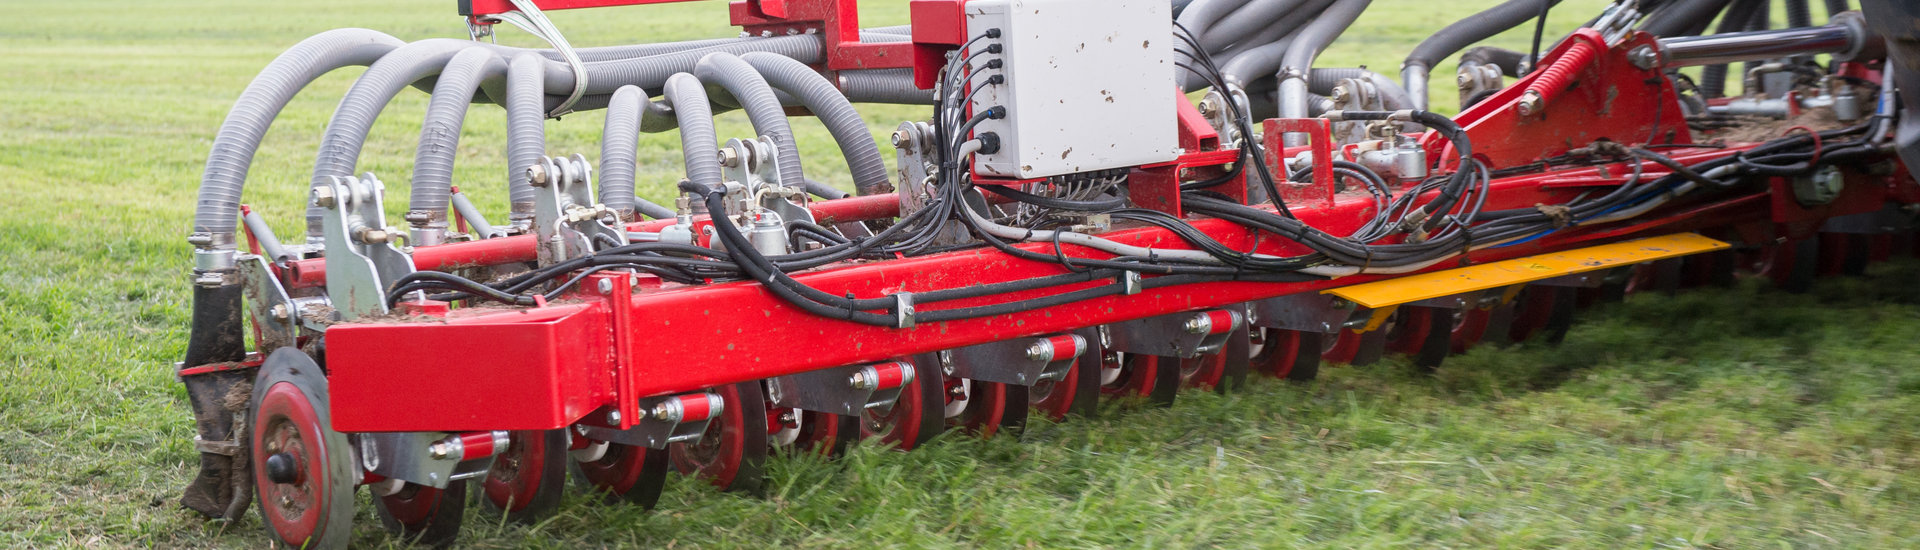 Schuitemaker GPS grassland injector